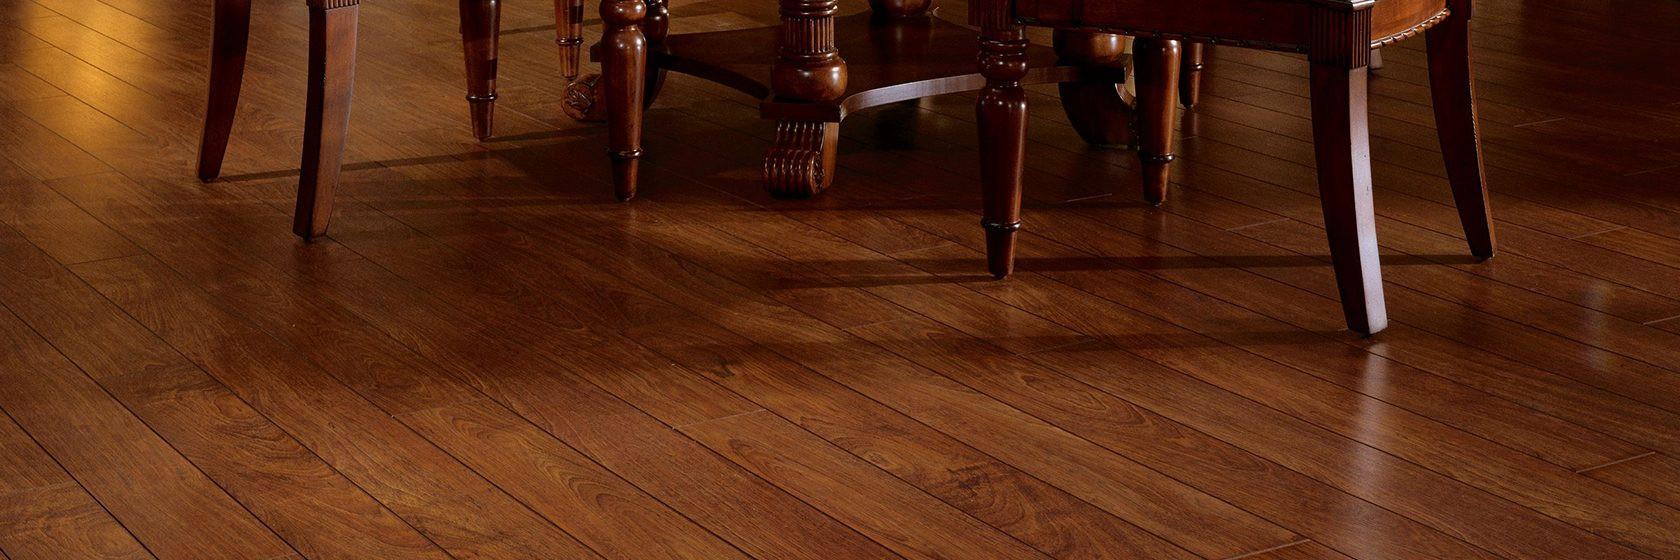 average price per square foot to install hardwood flooring of laminate exotic olive ash l8708 pertaining to hero l 1680 560